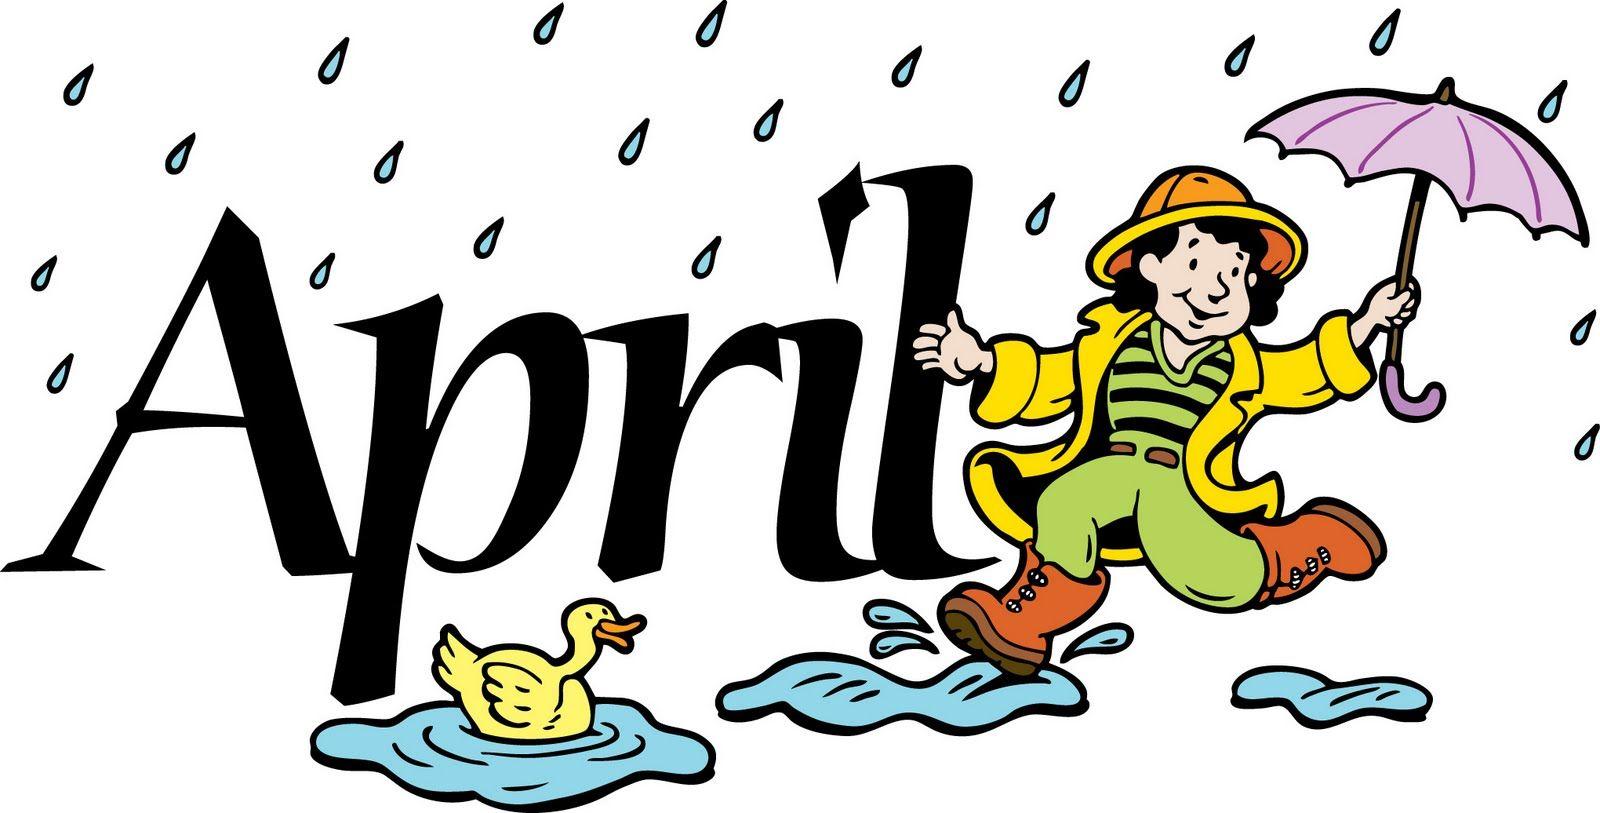 Month April clipart pictures 2019